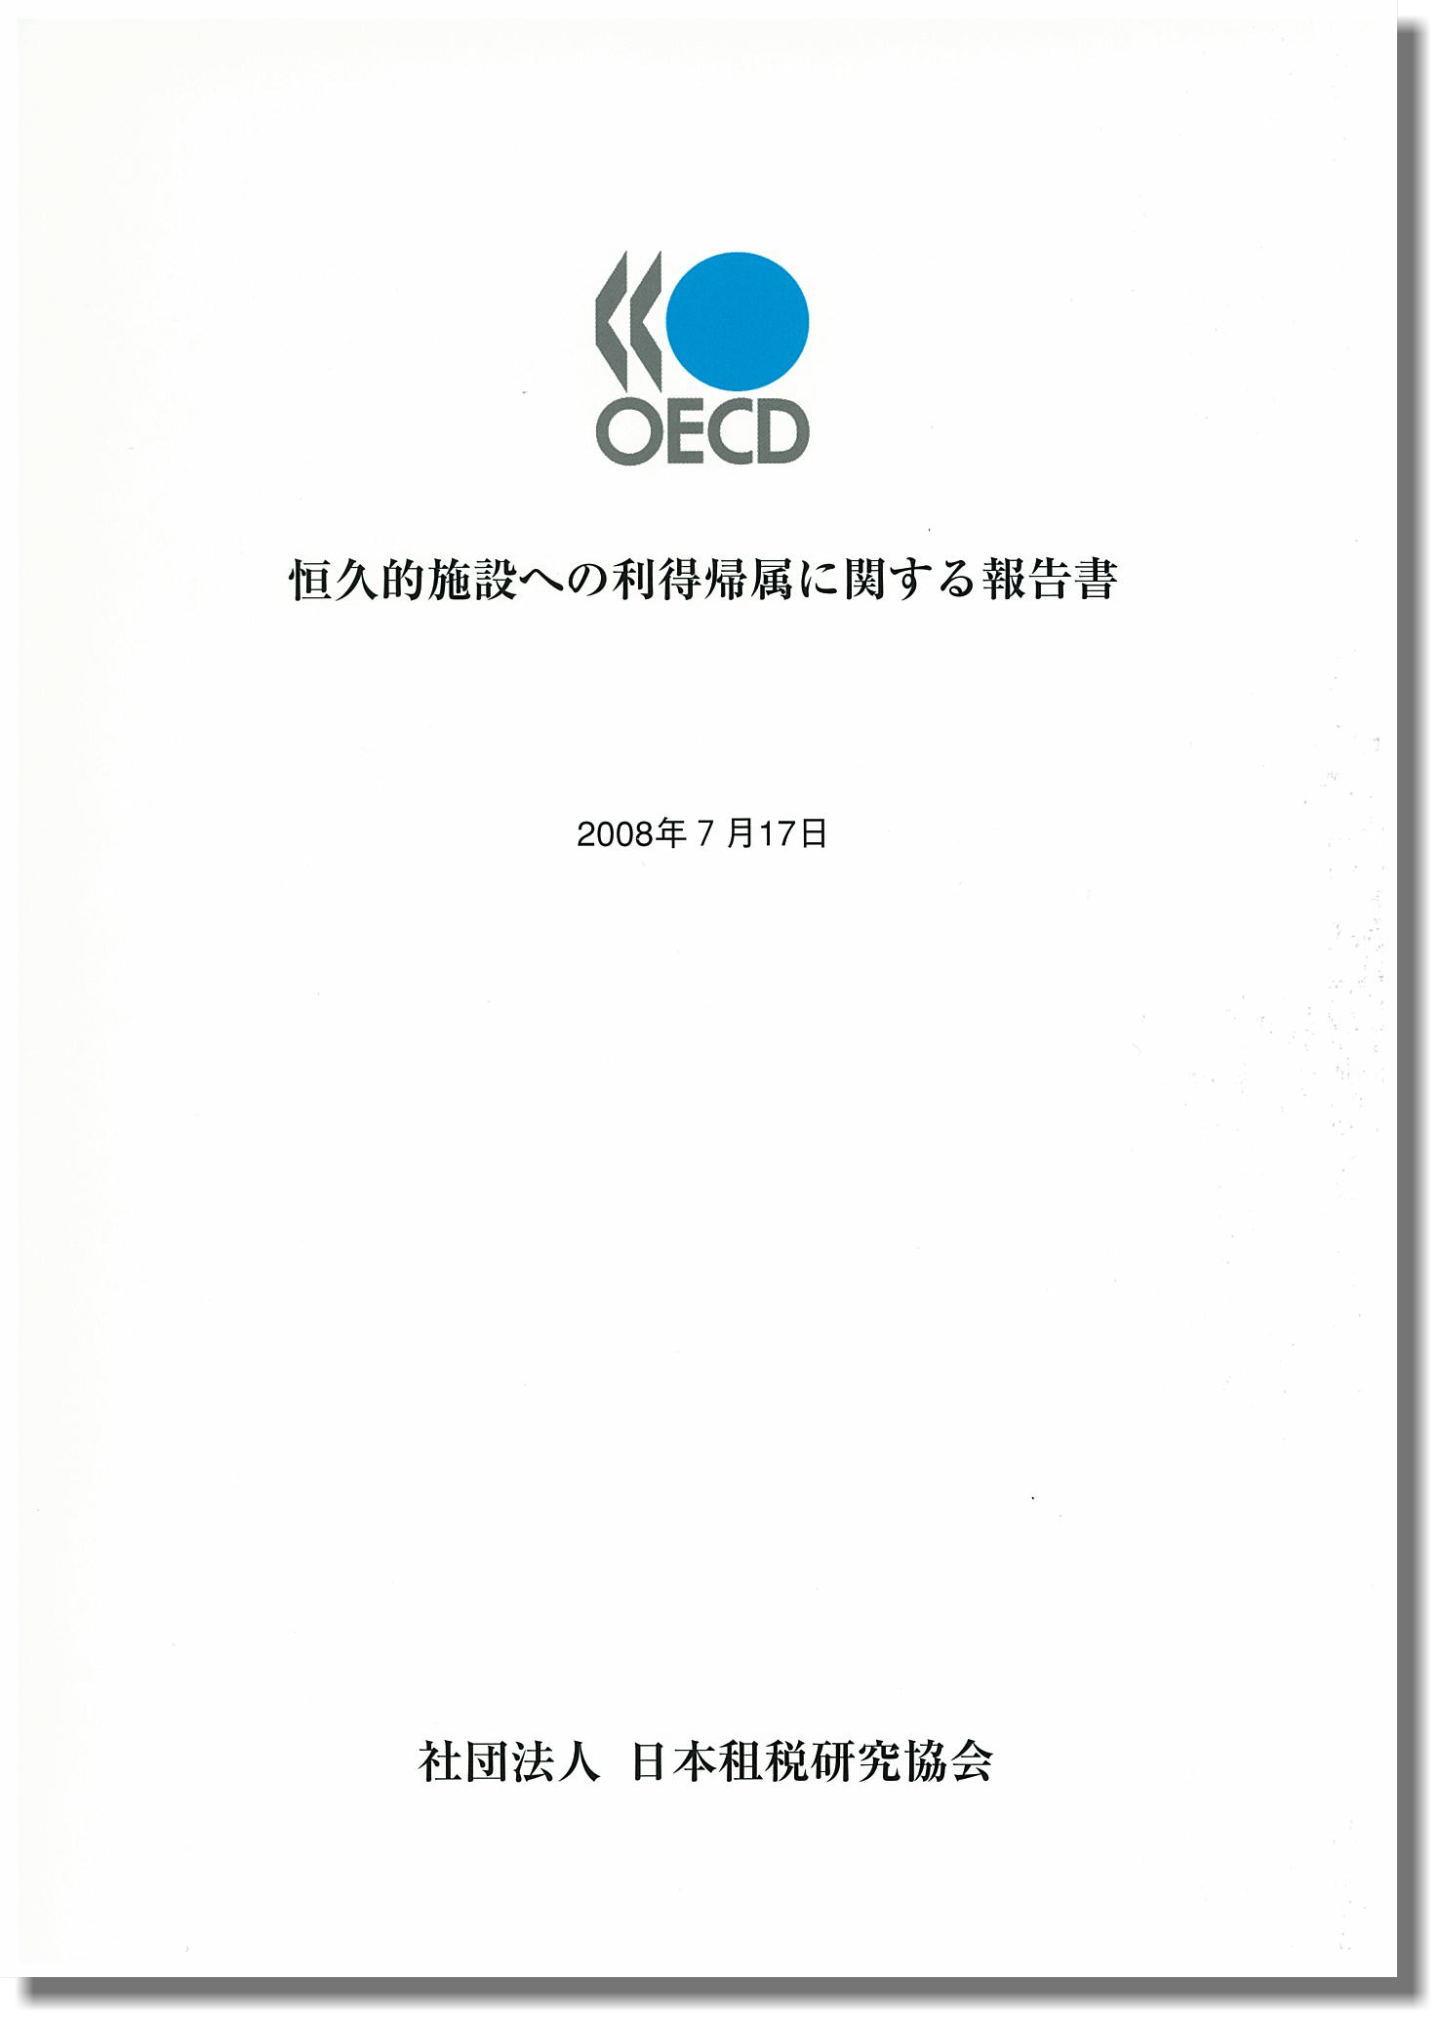 OECD 恒久的施設への利得帰属に関する報告書 2008年7月17日